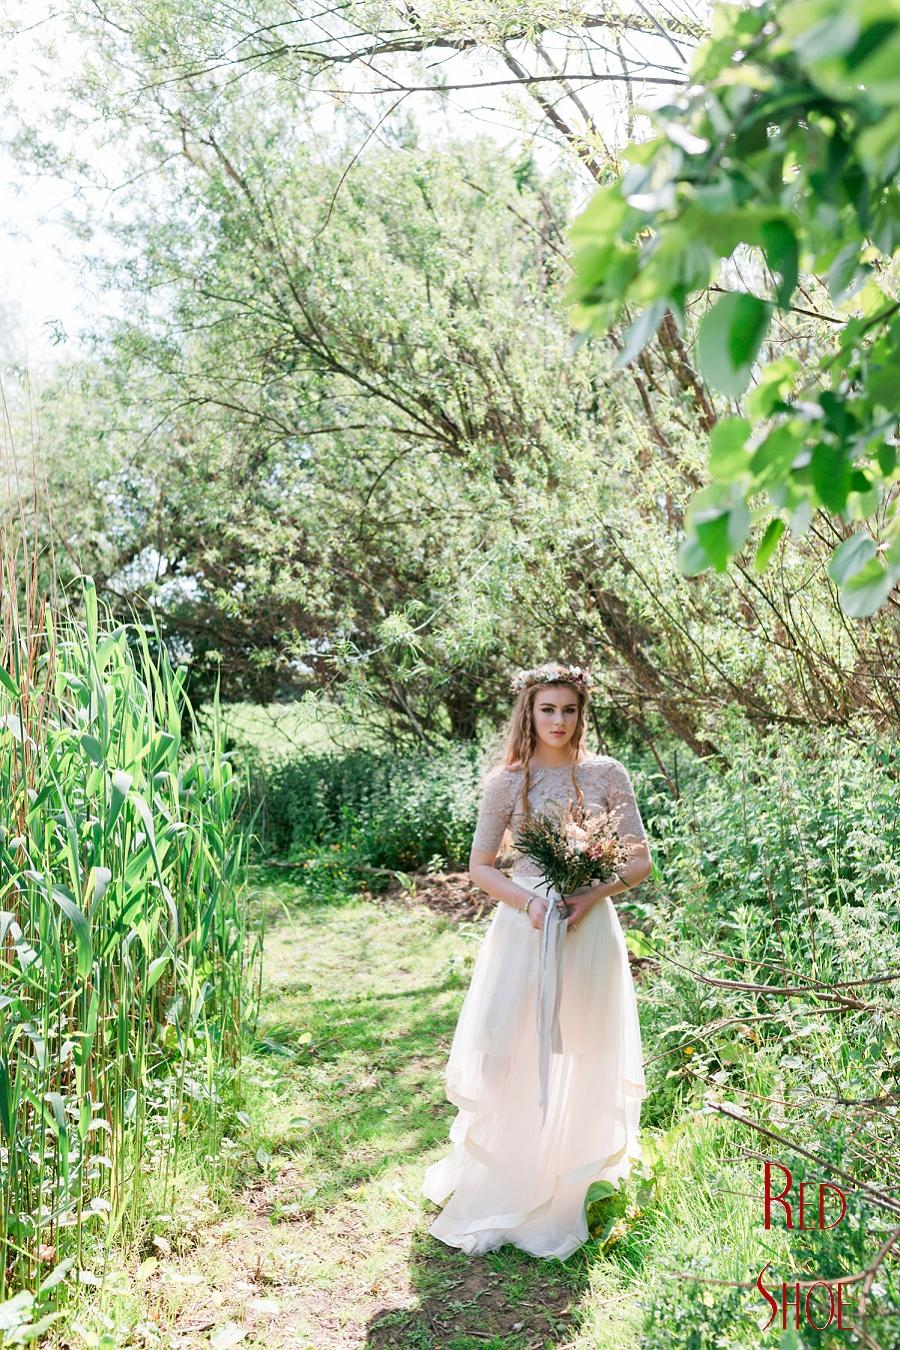 Boho bride, Glam Boho bride, Wedding inspiration, Styled wedding photo shoot, wedding ideas, wedding flower ideas, wedding photography, dried wedding flowers, boho bride makeup ideas_0106.jpg